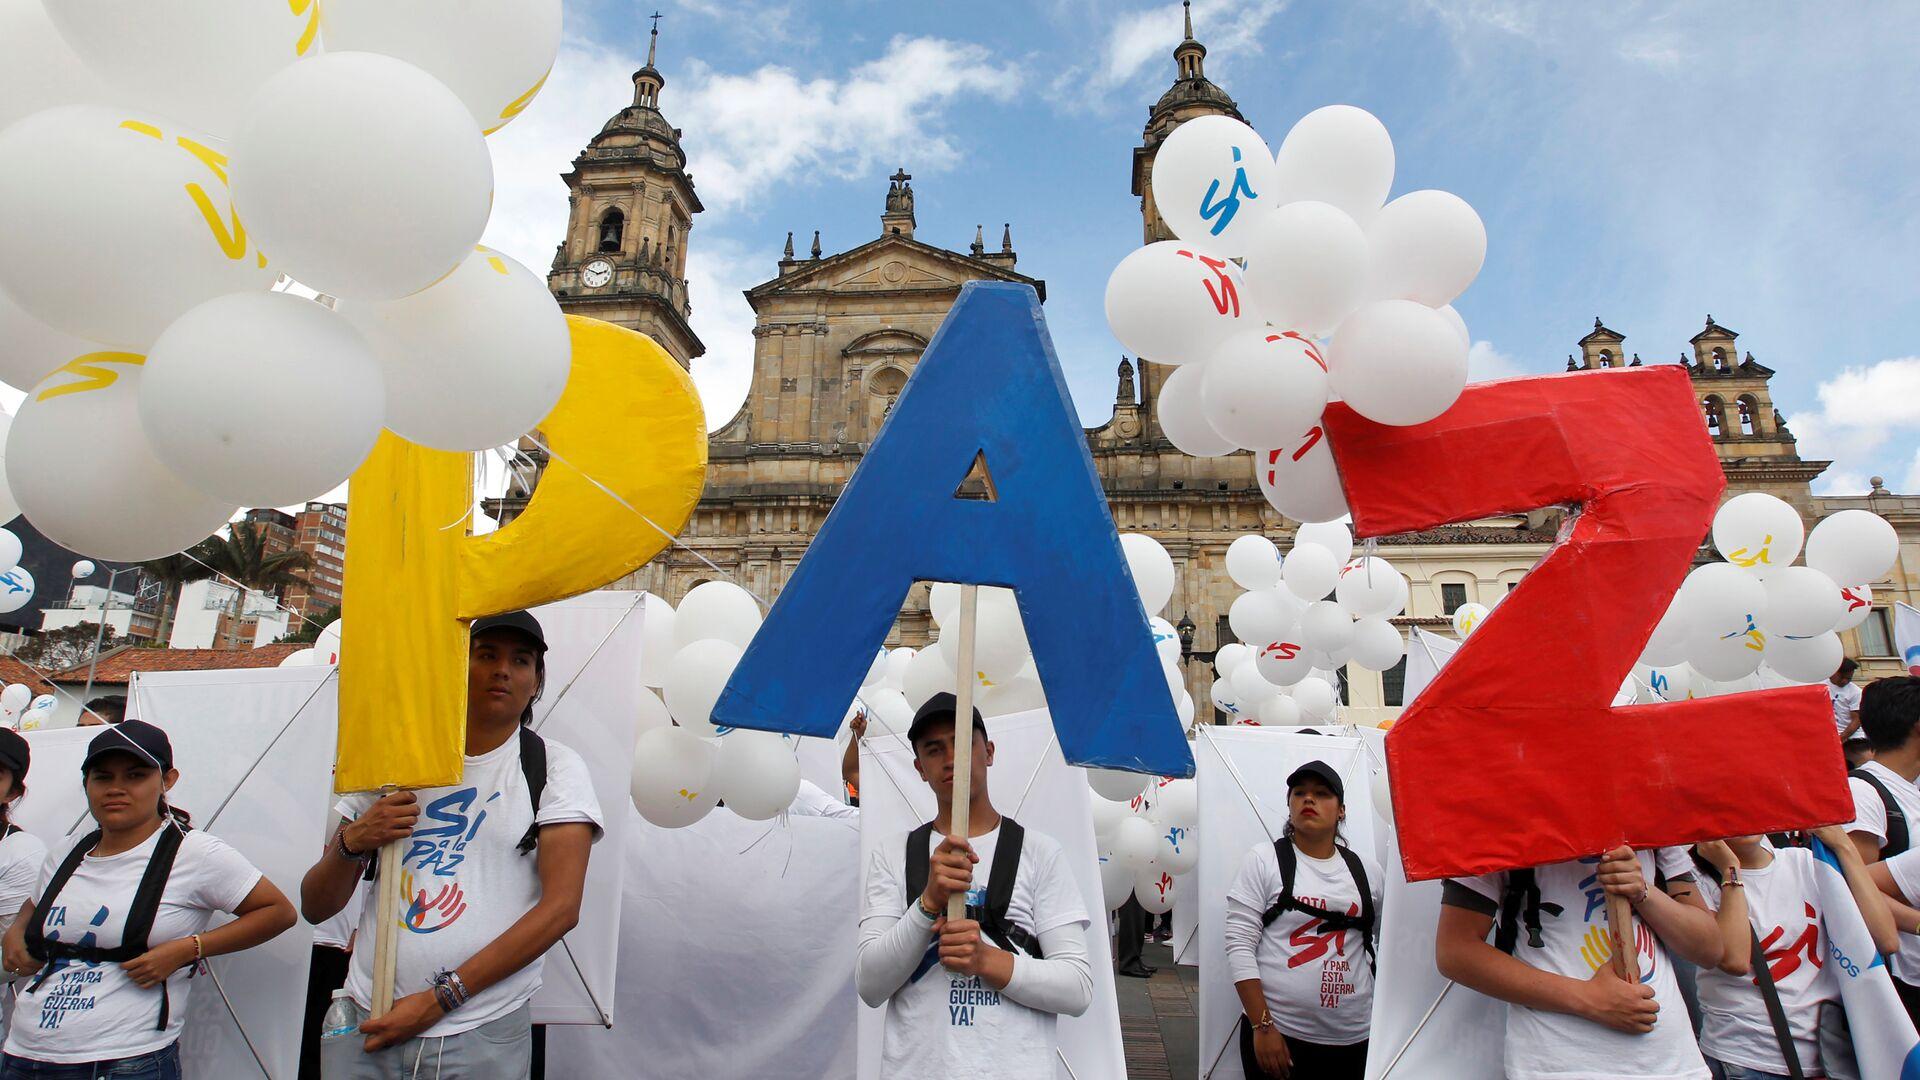 Acuerdo de paz en Colombia - Sputnik Mundo, 1920, 24.09.2021